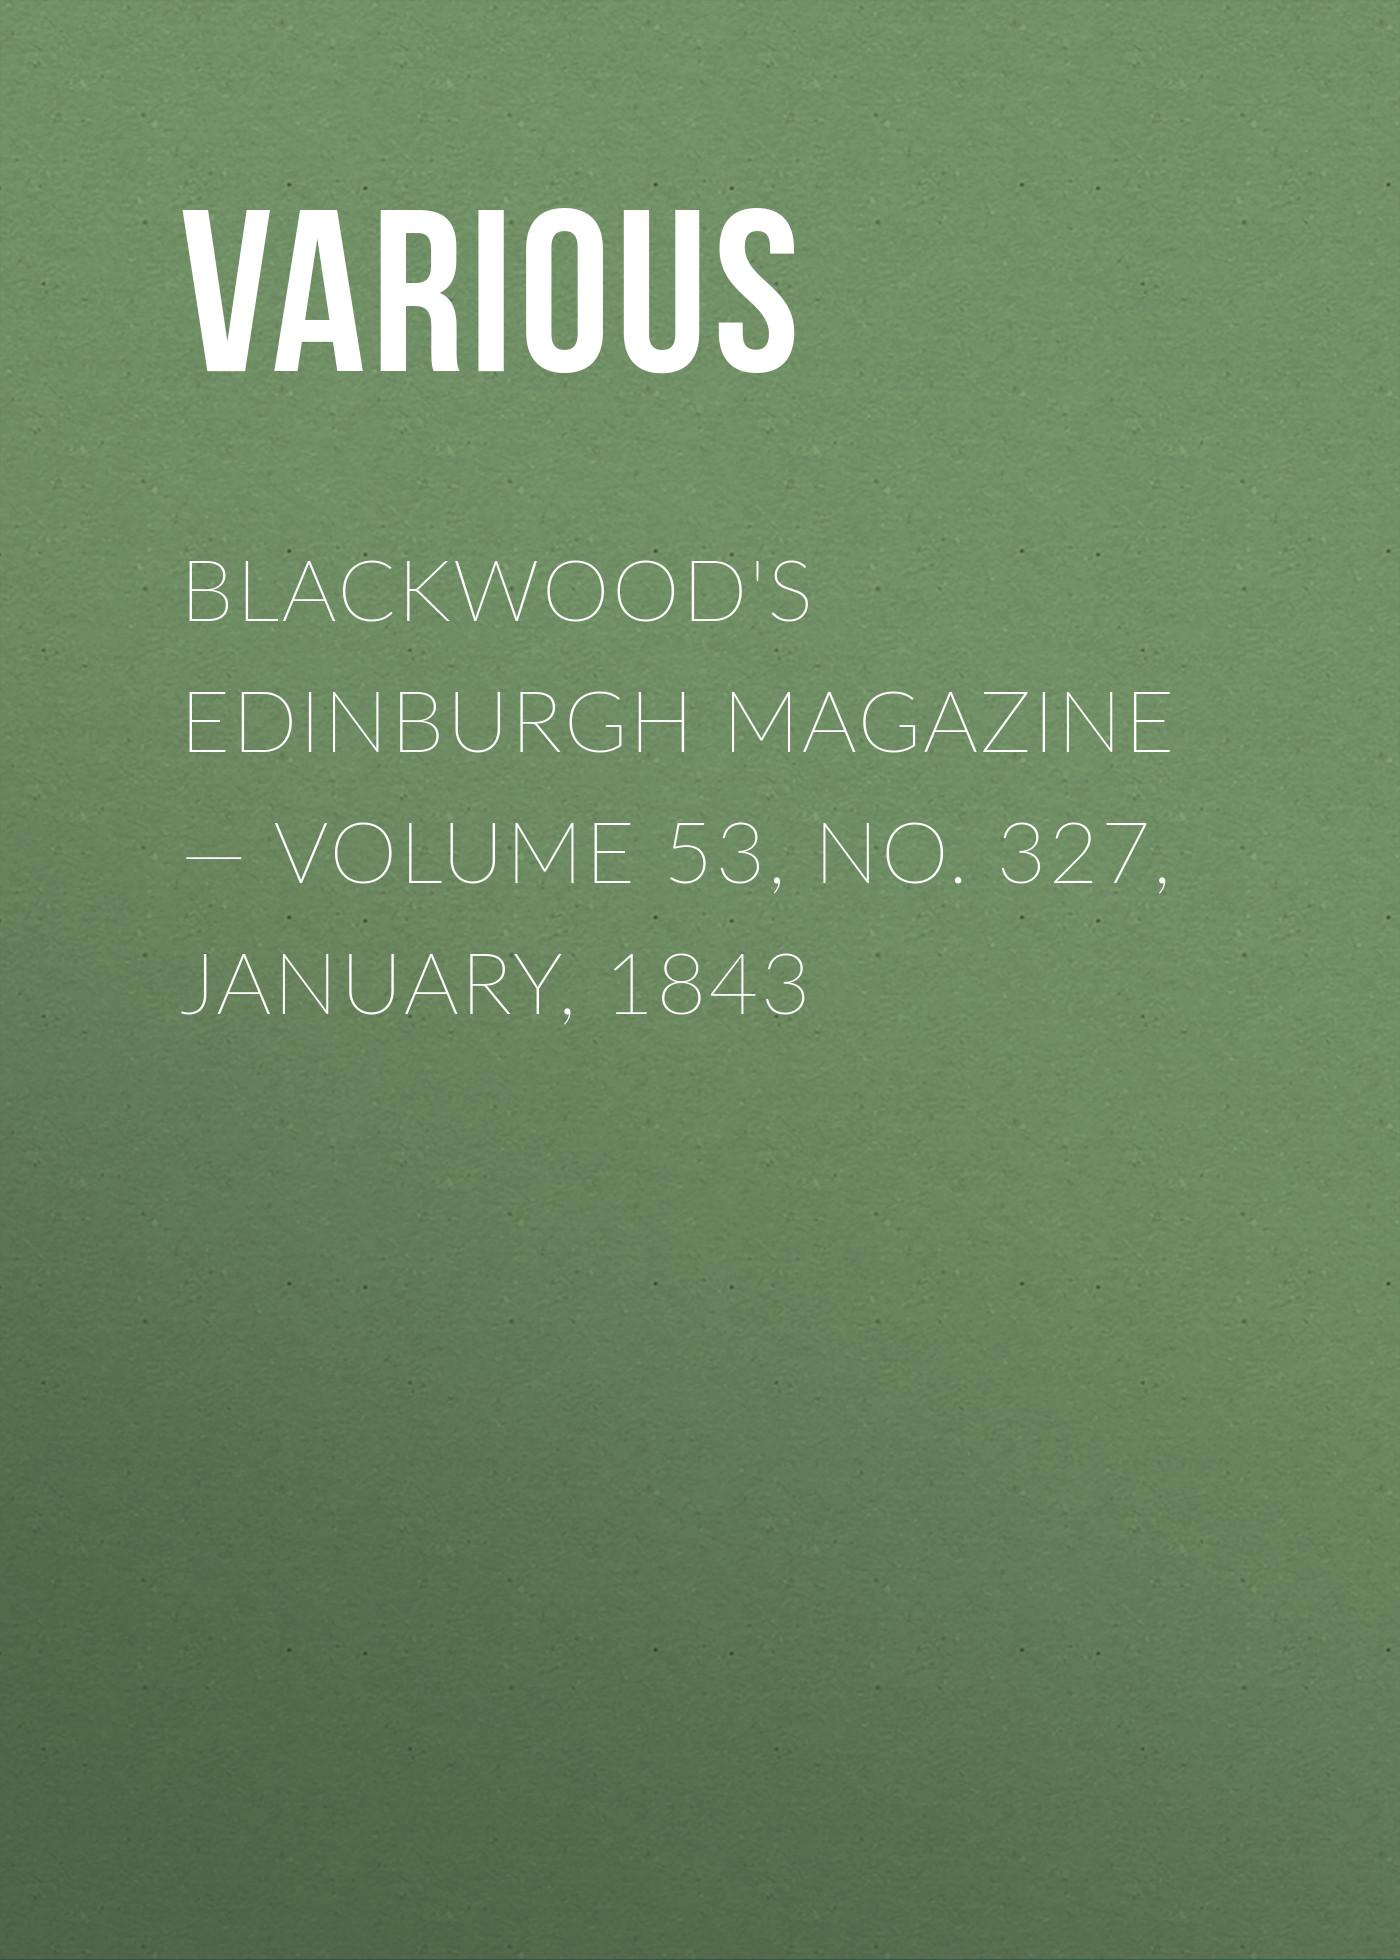 Blackwood's Edinburgh Magazine — Volume 53, No. 327, January, 1843